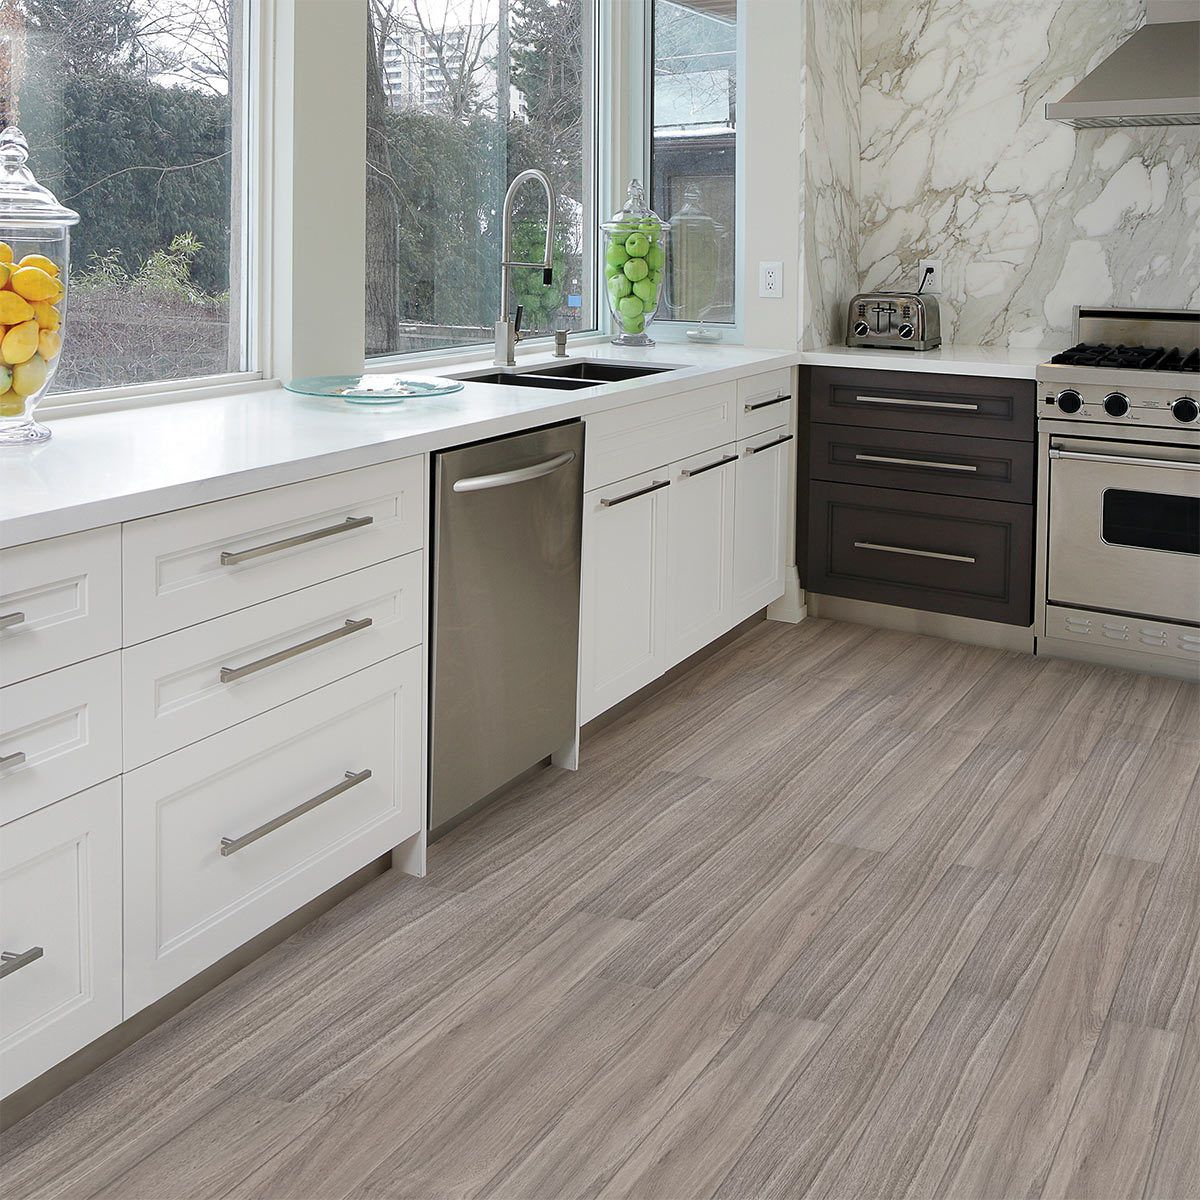 Golden Select Oyster Rigid Core SPC Luxury Vinyl Flooring